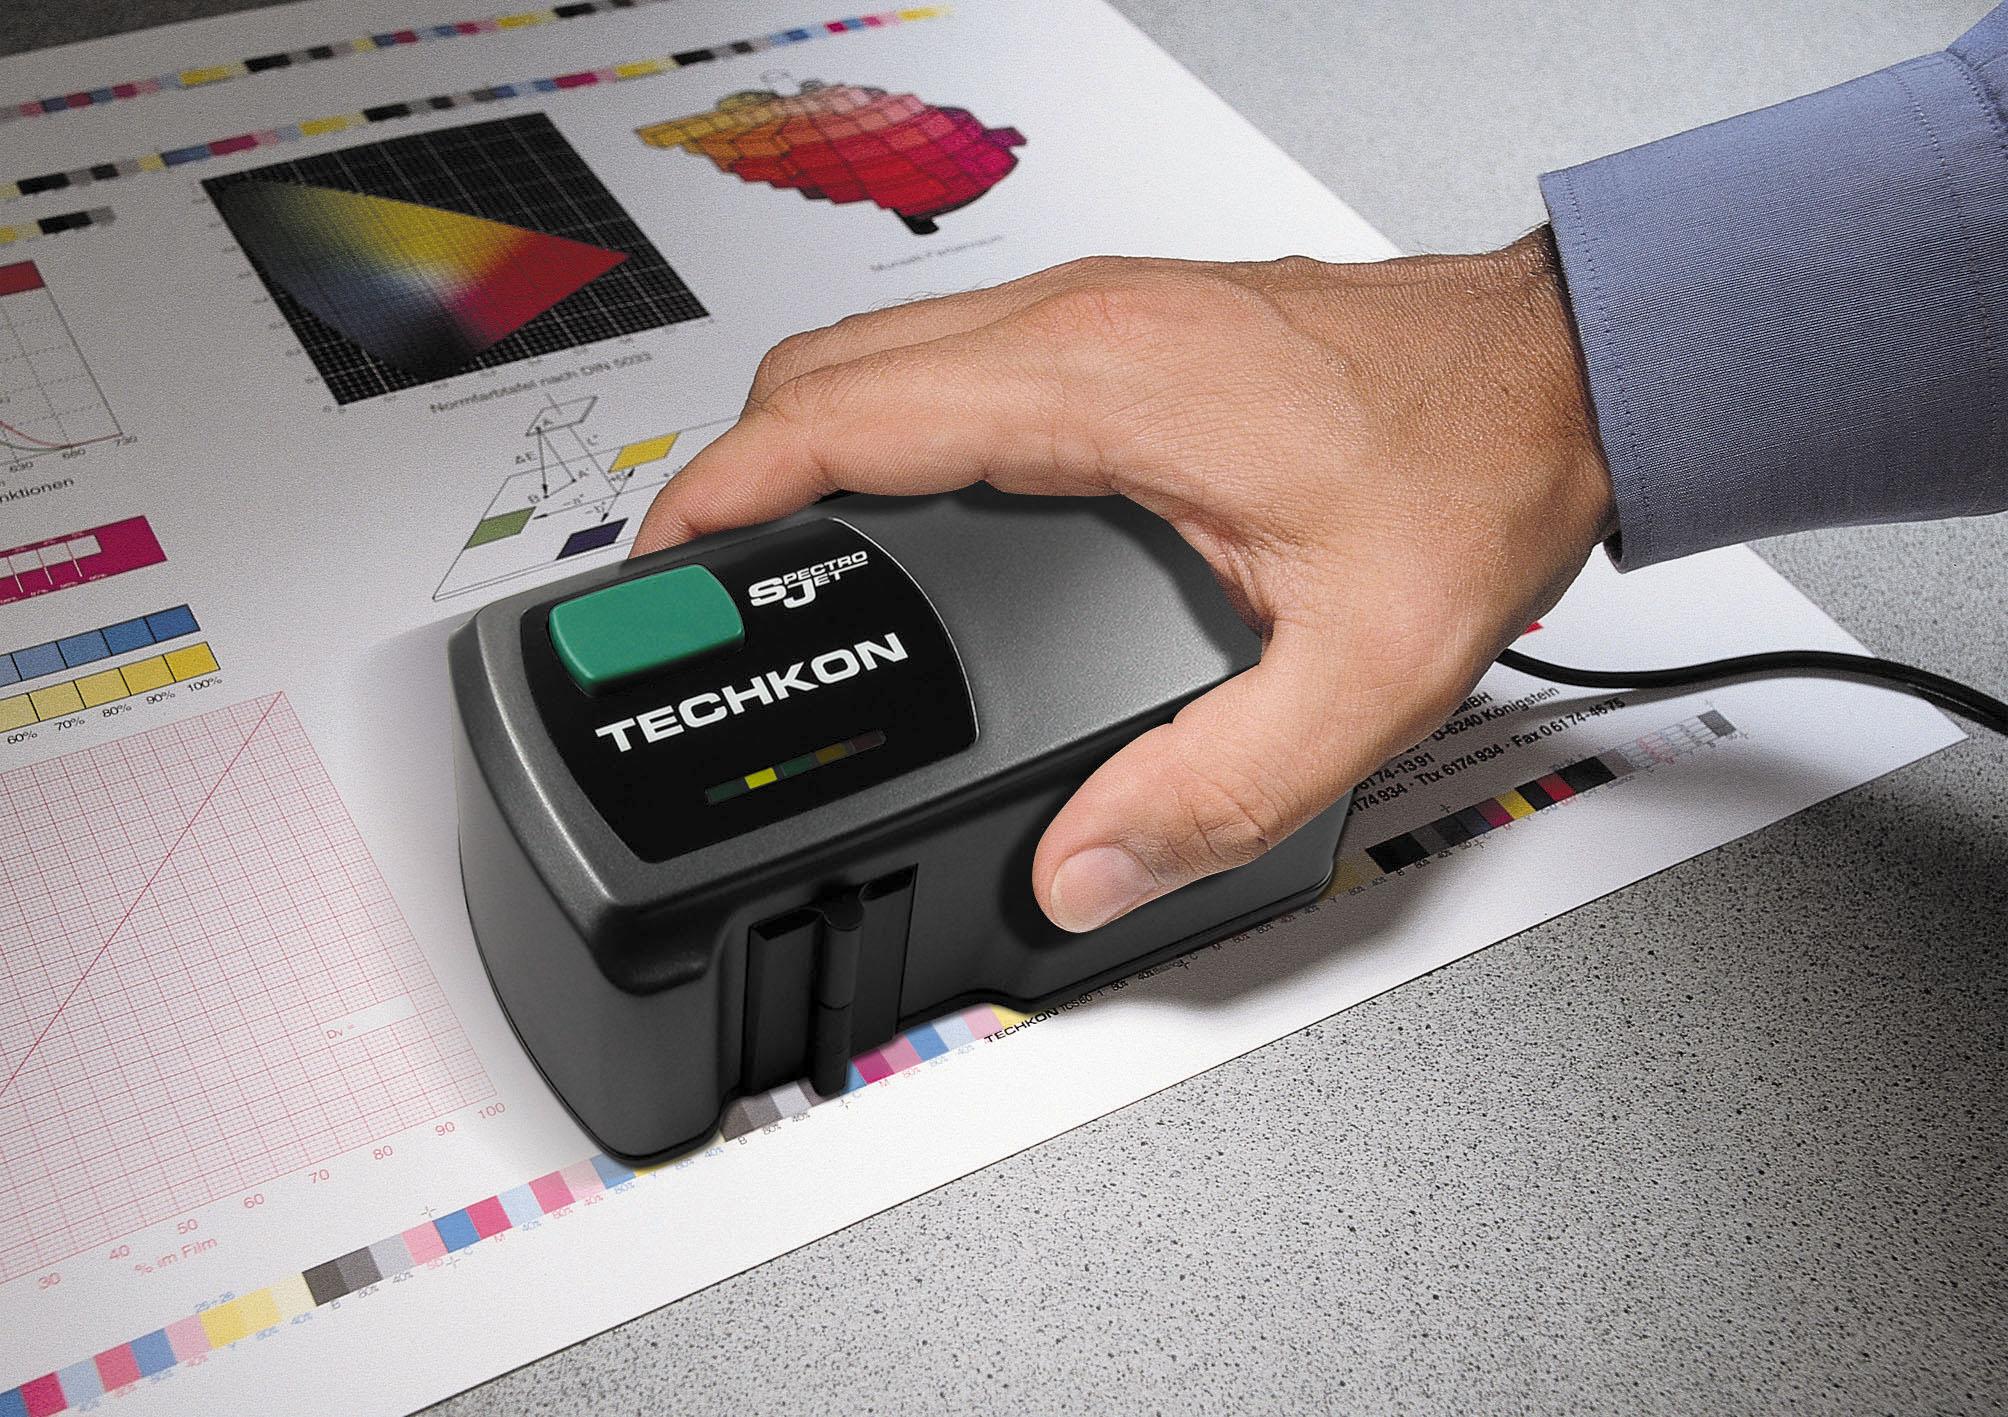 Techkon SpectroJet w/ ExPresso